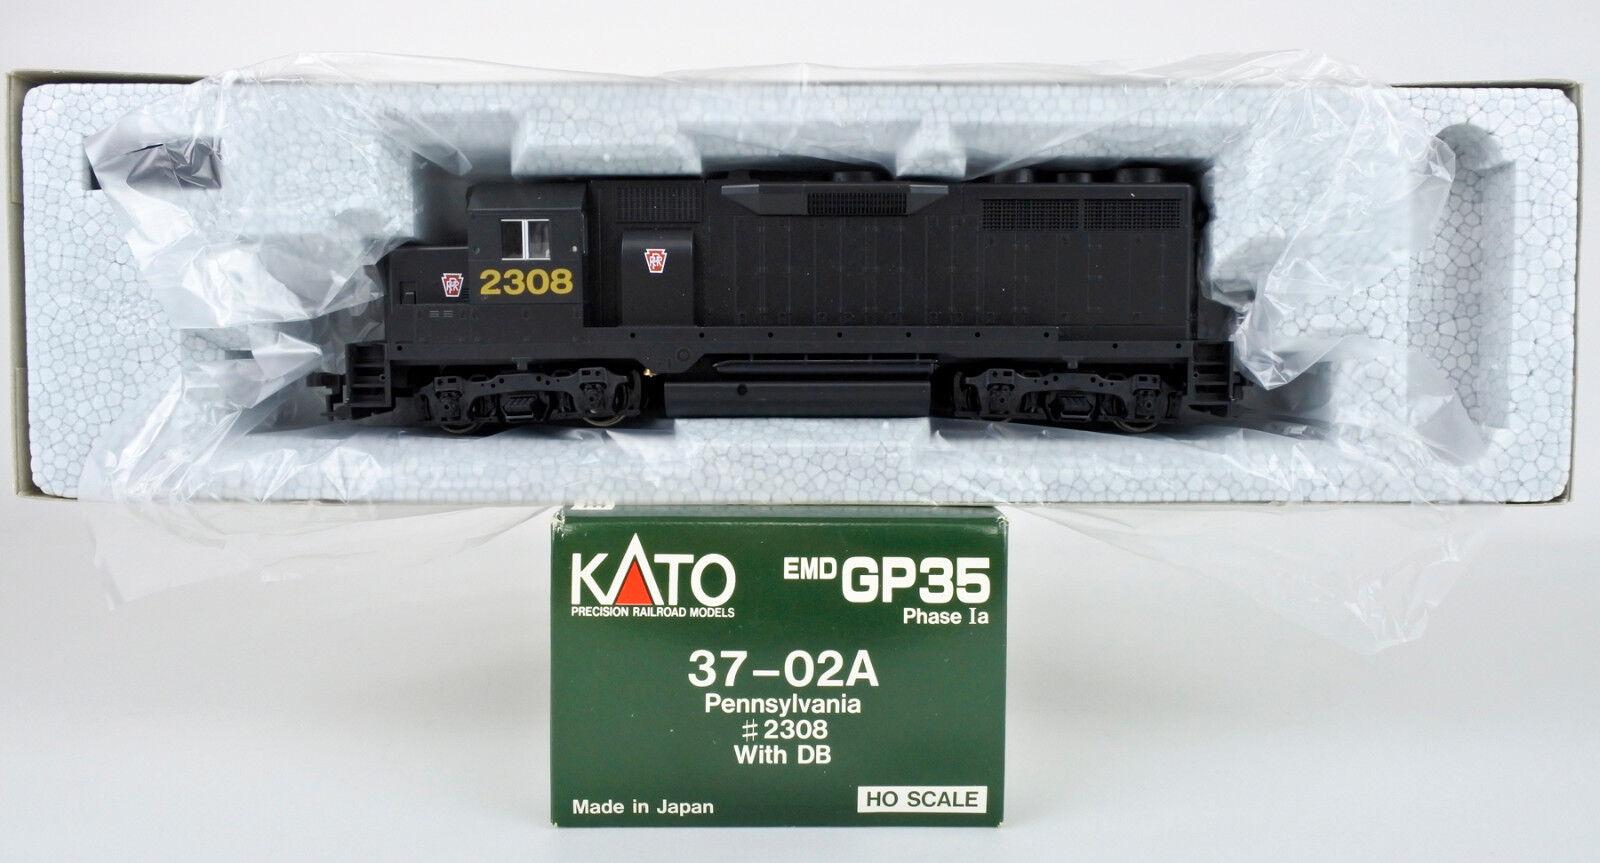 Kato HO escala 37-02 A Pennsylvania EMD GP-35 pahase ia Diesel motor con Dragonball  2308